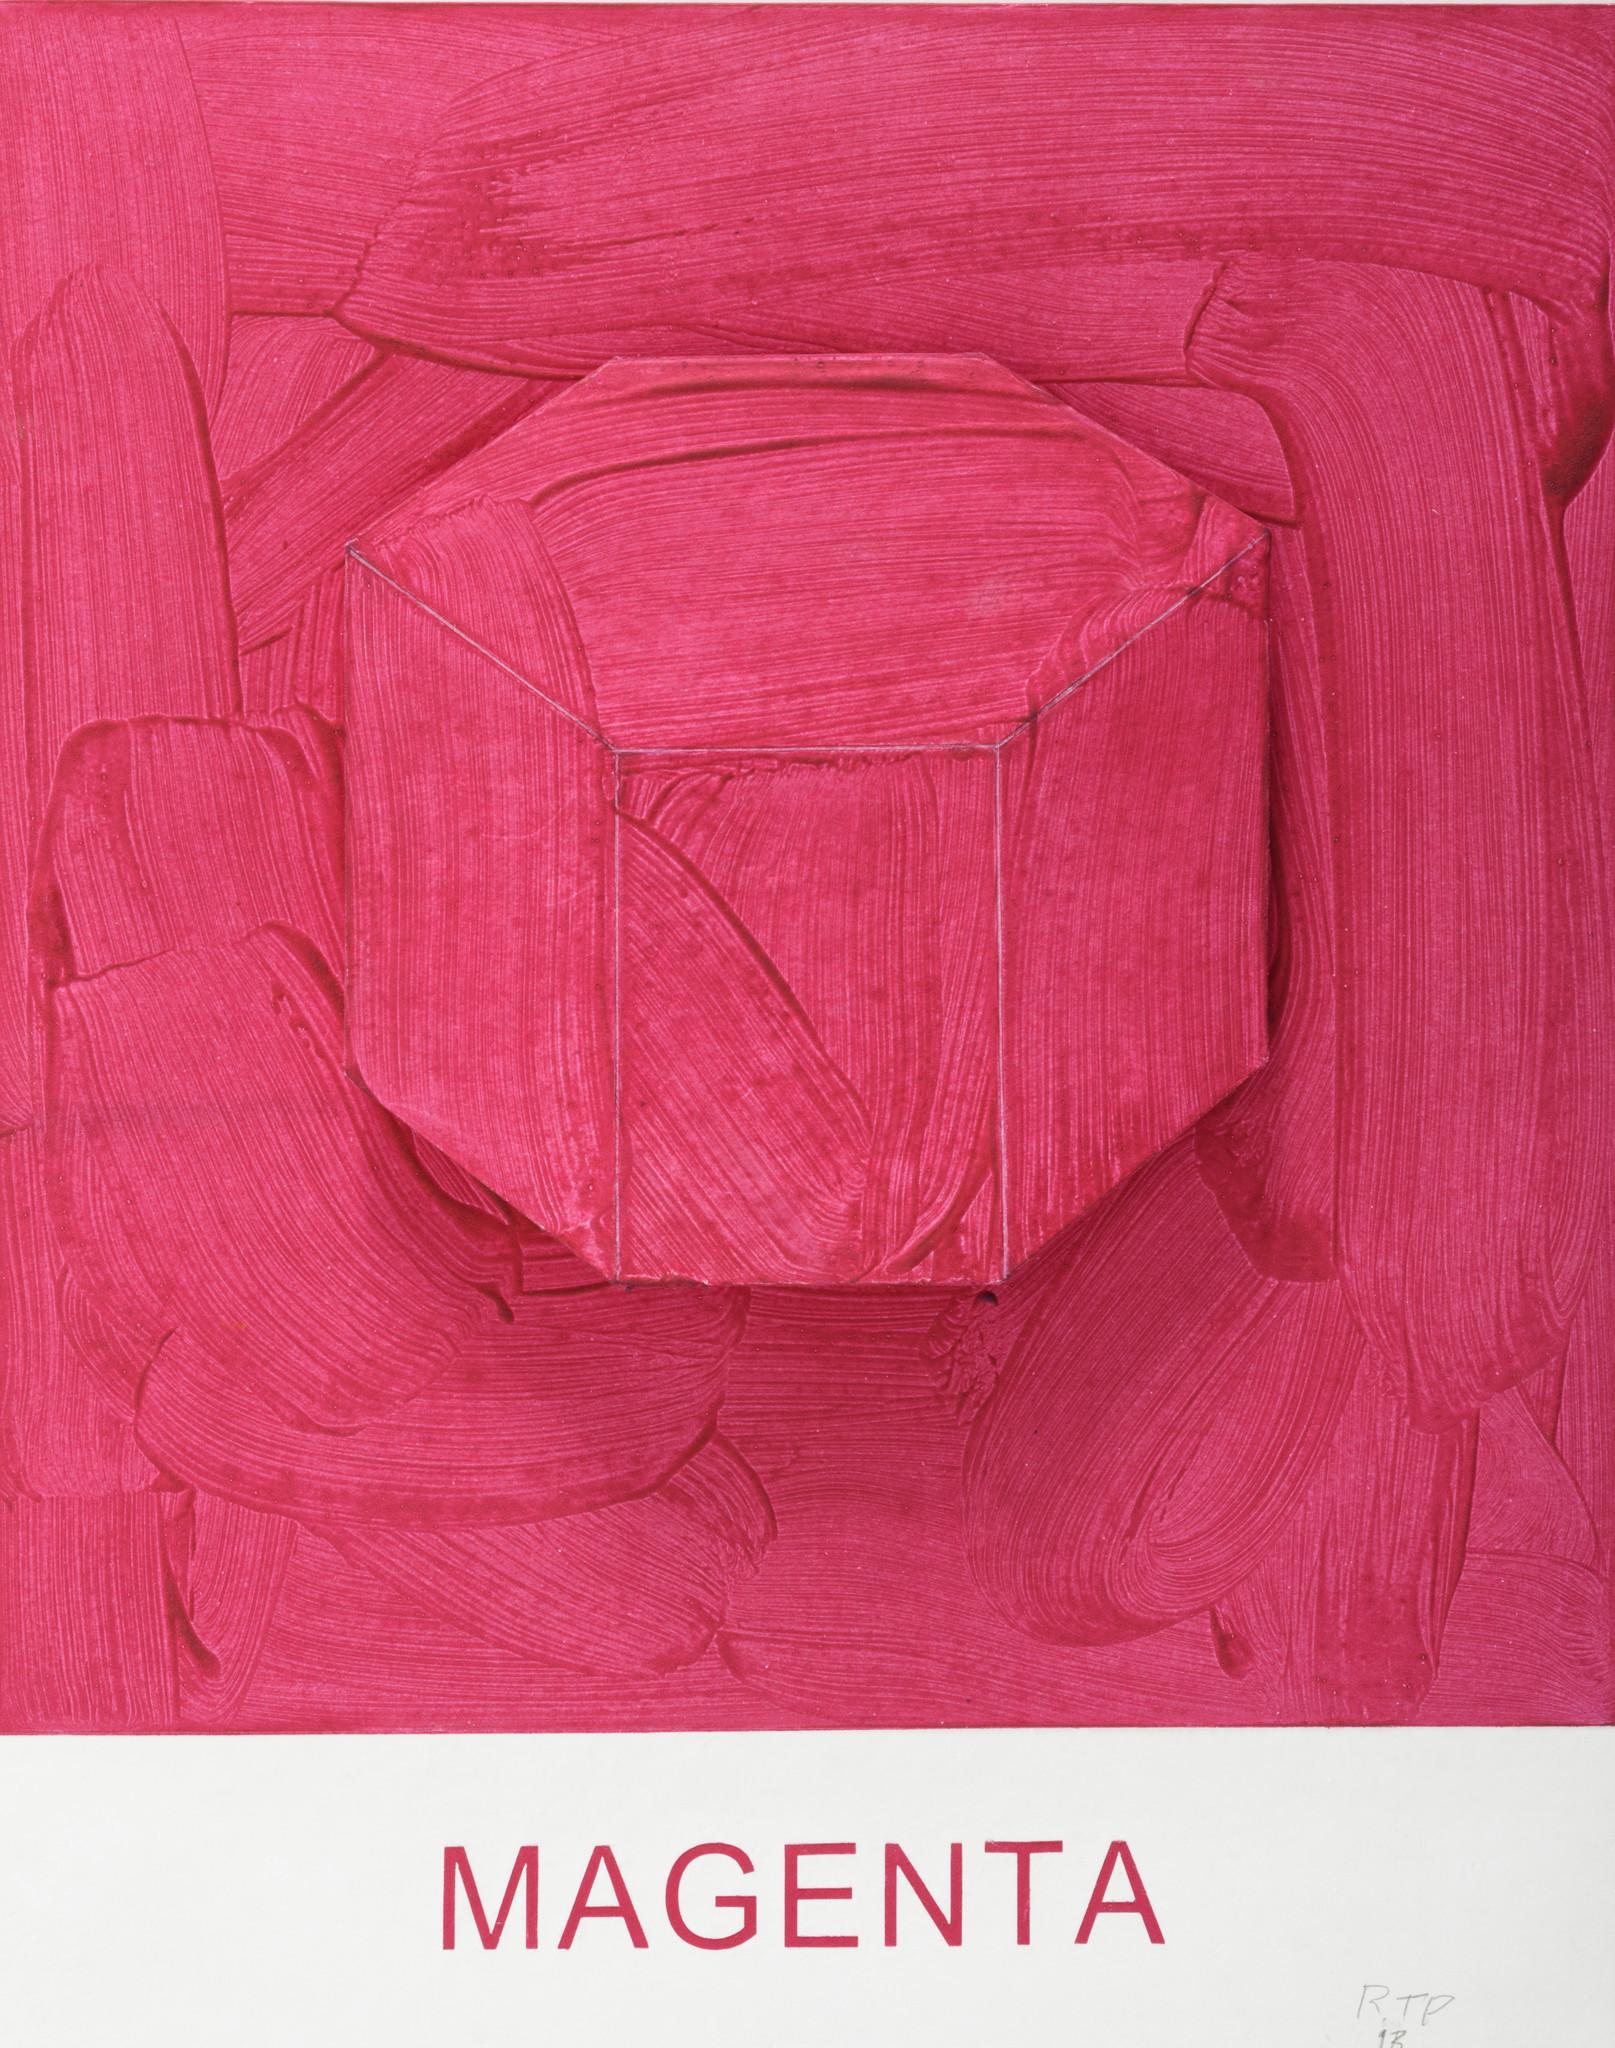 """Eight Colorful Inside Jobs: Magenta,"" 2017, by John Baldessari — at Mixografia."